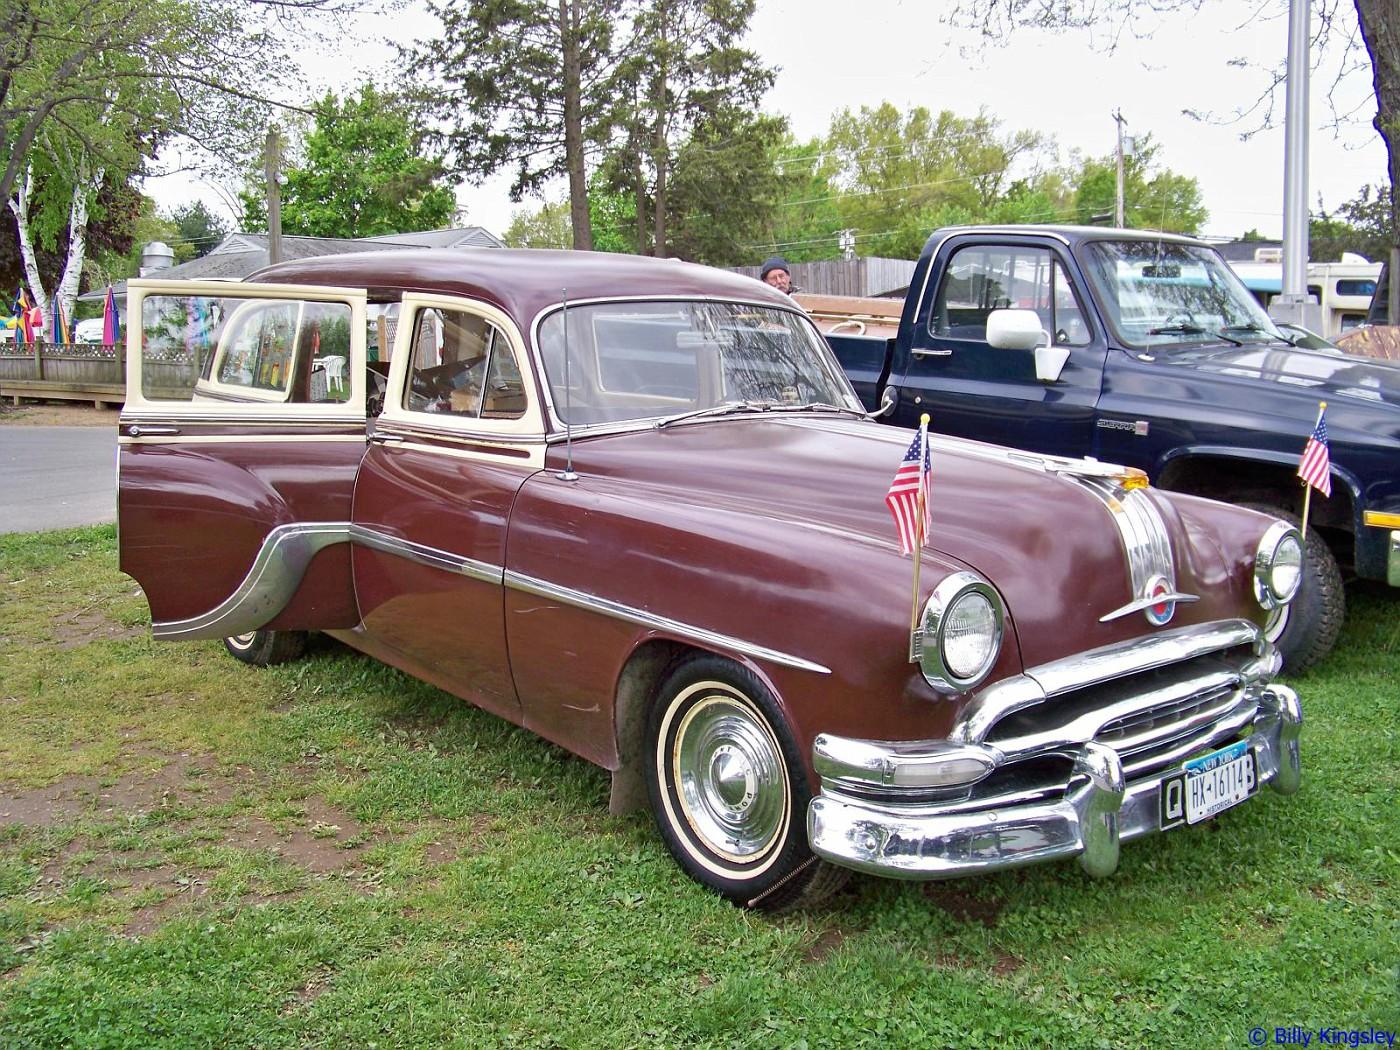 1954 Pontiac Chieftan Deluxe Station Wagon